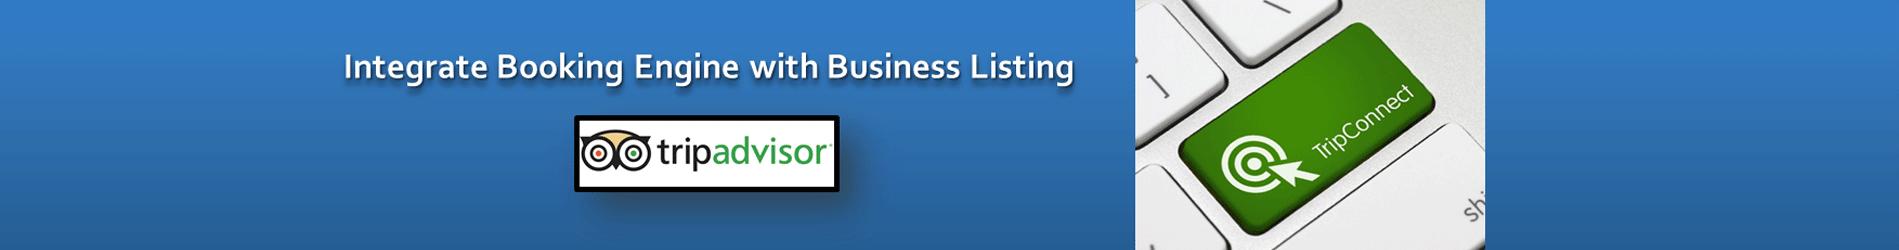 TripAdvisor TripConnect  BookingCenter Certified Partner